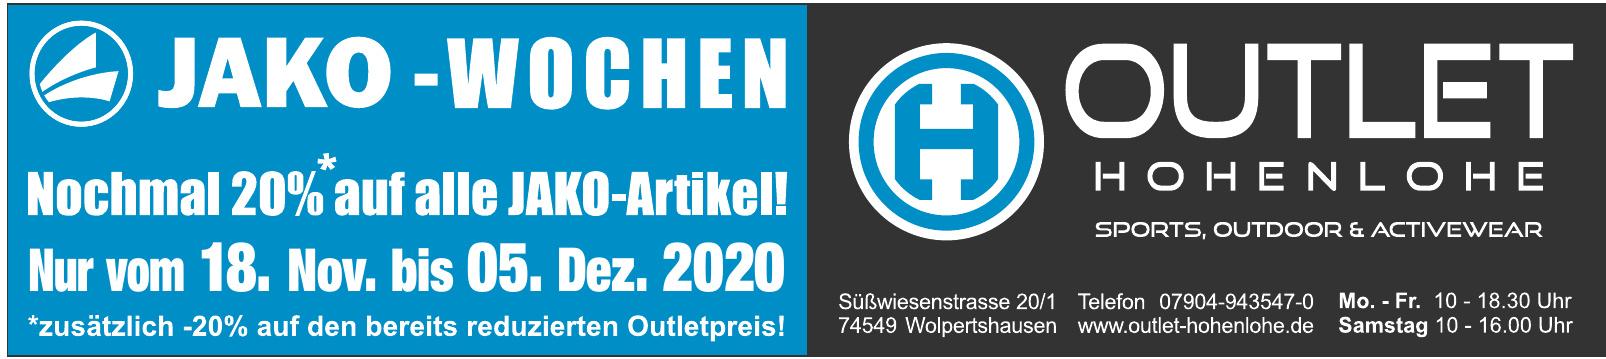 Outlet Hohenlohe